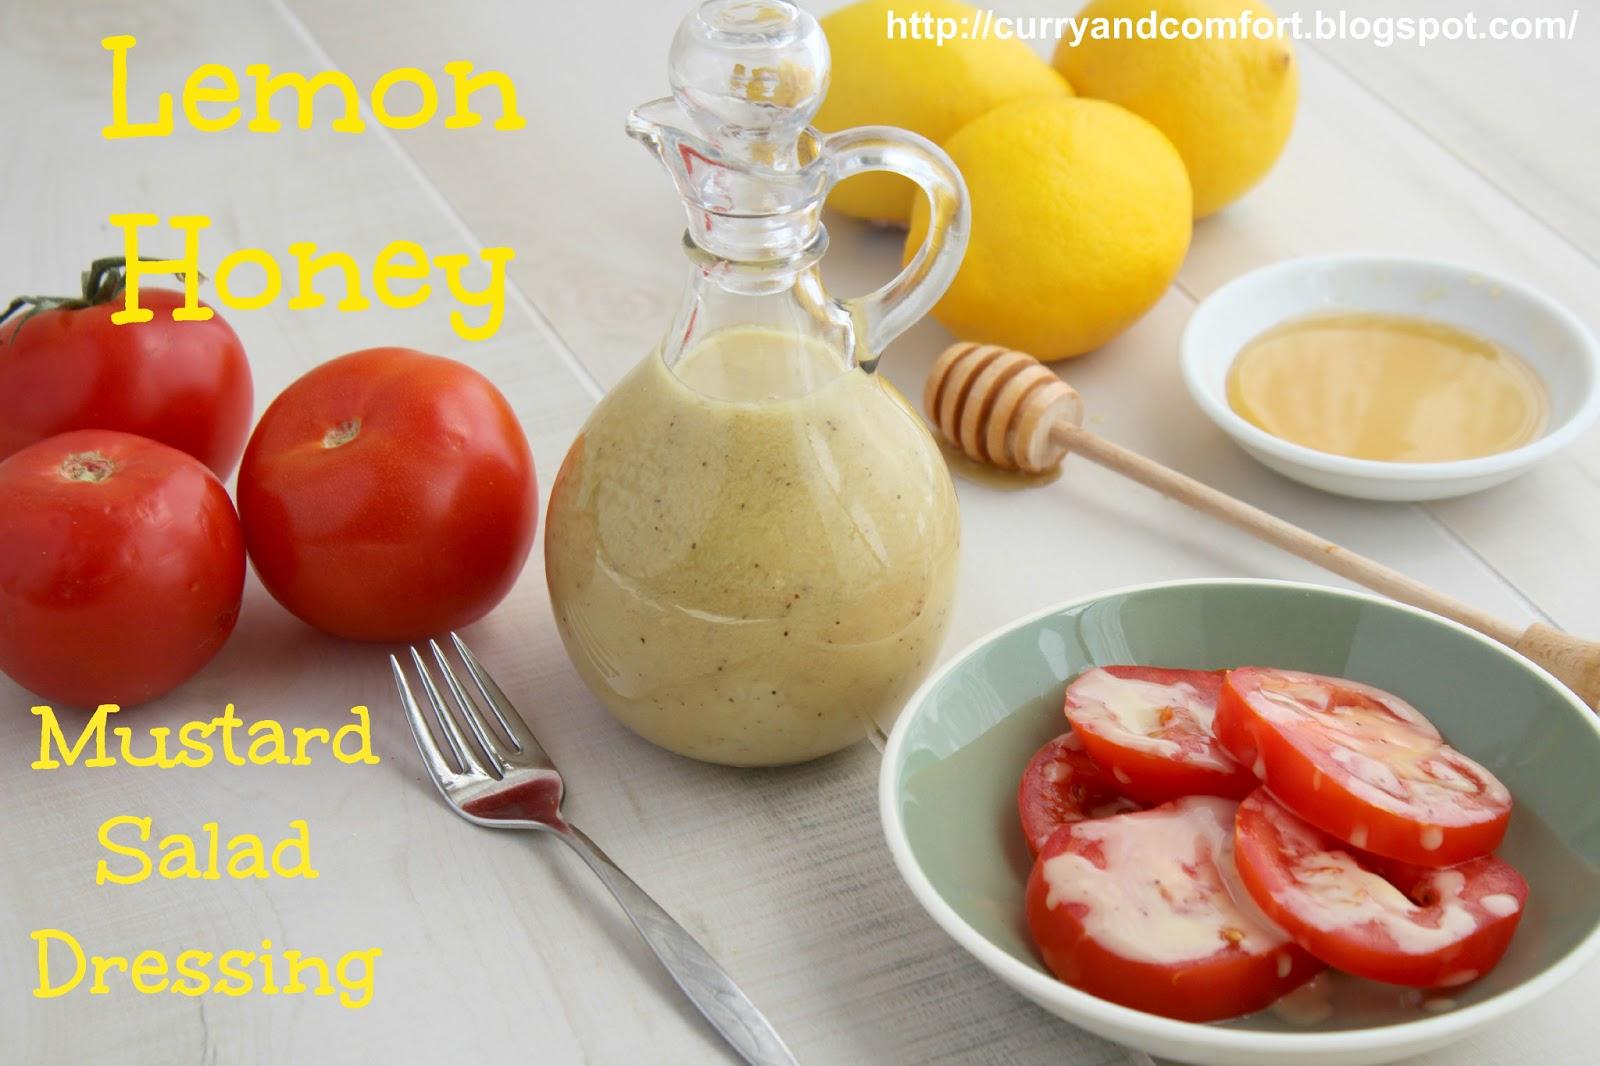 Curry and Comfort: Lemon Honey Mustard Salad Dressing